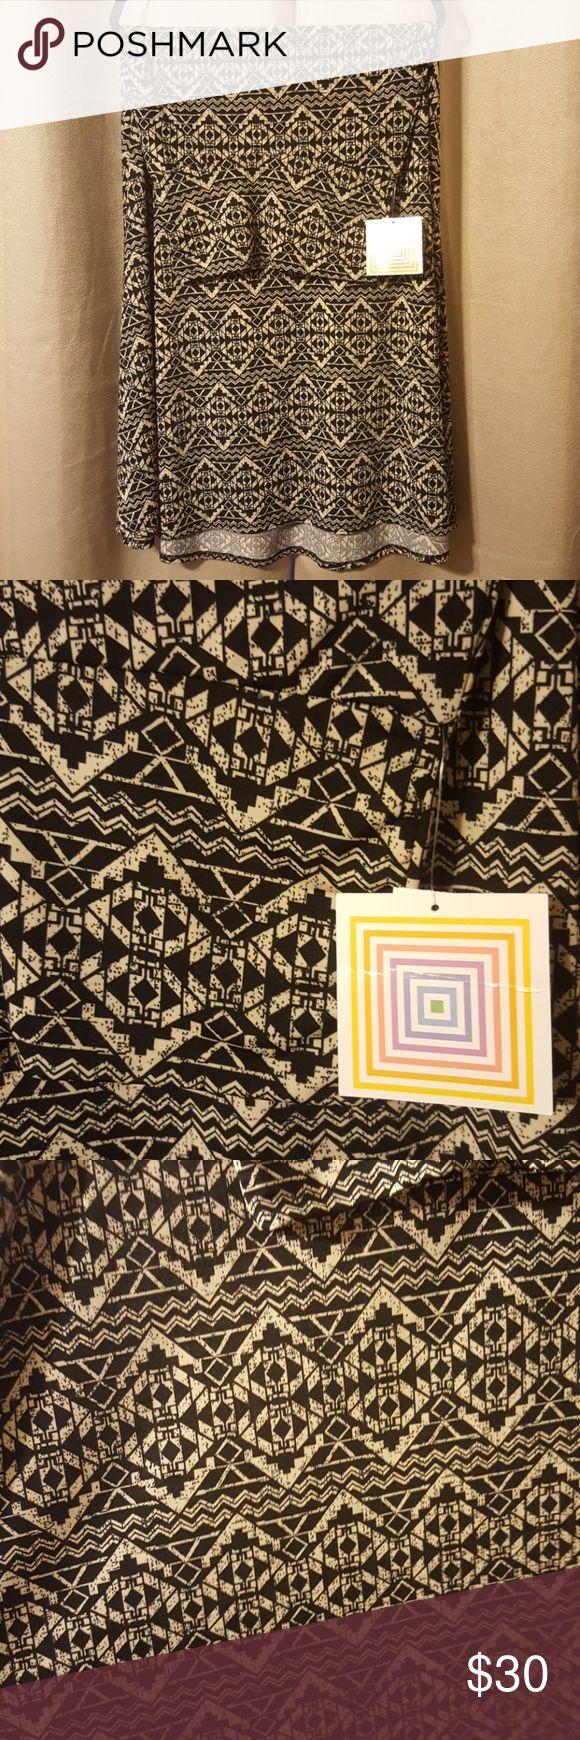 Brand new LulaRoe Maxi skirt Black and off-white aztec design. Slinky material. LuLaRoe Skirts Maxi